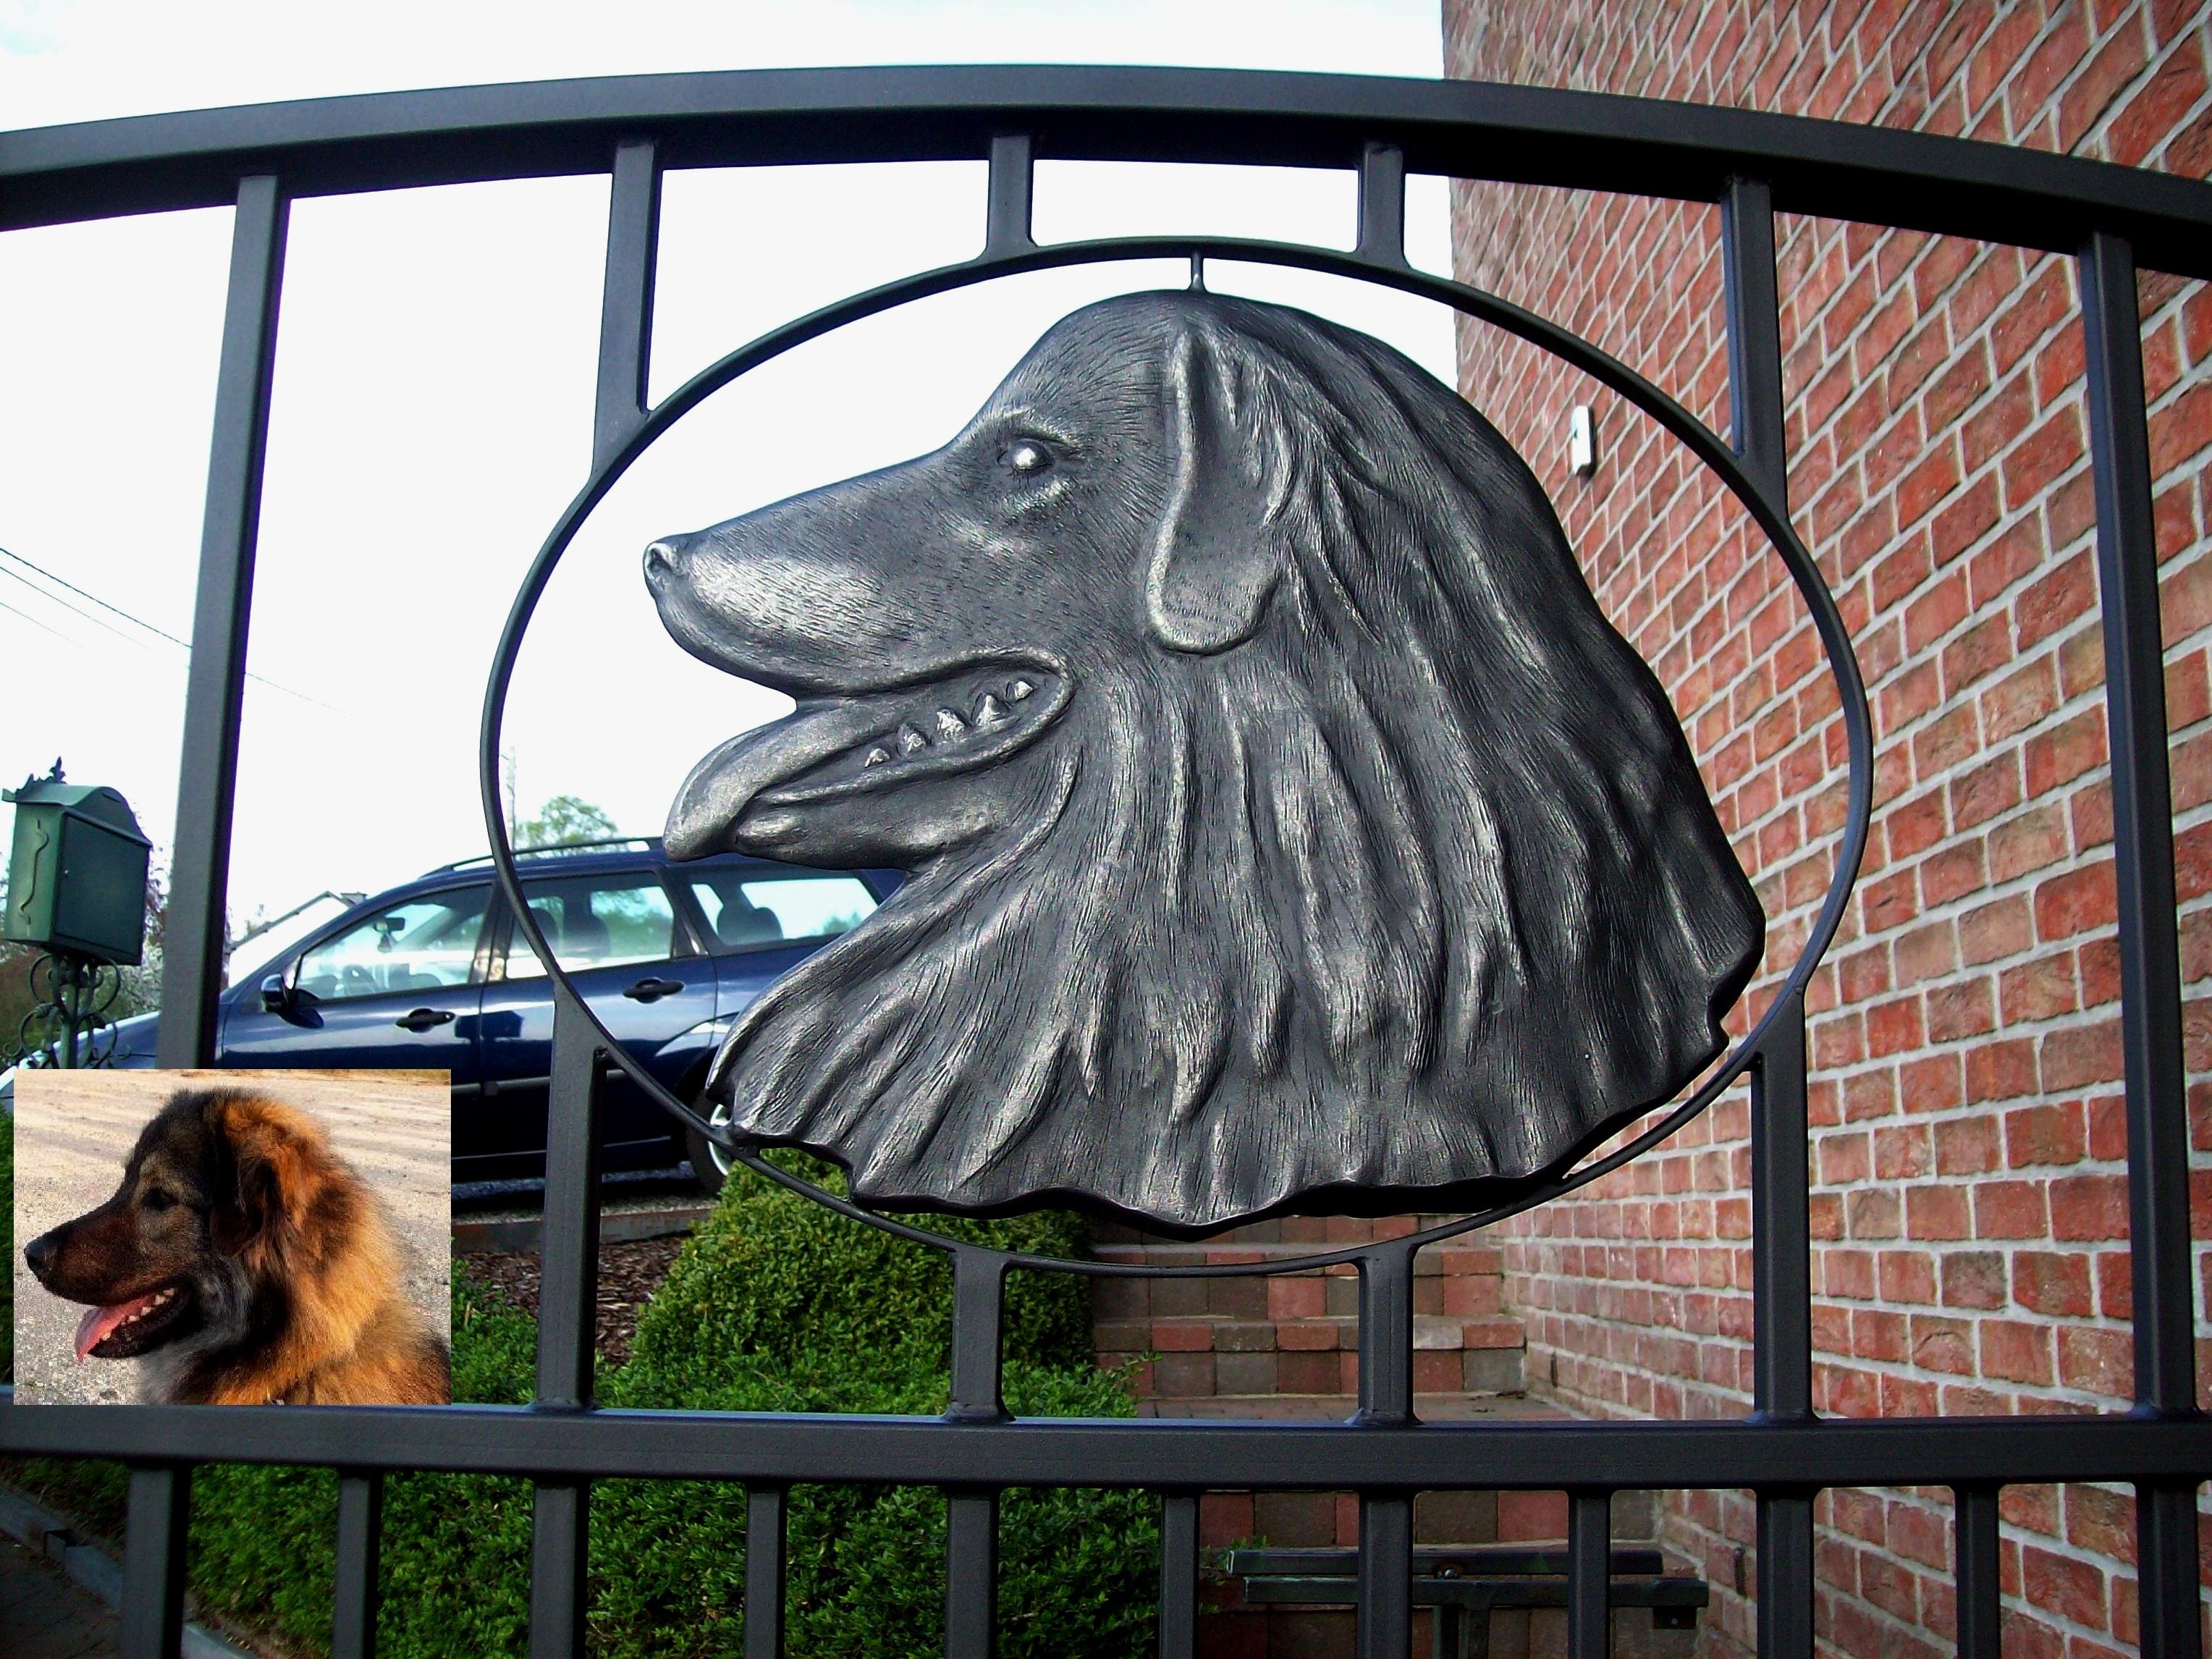 Hond in smeedijzer +Sarplaninac